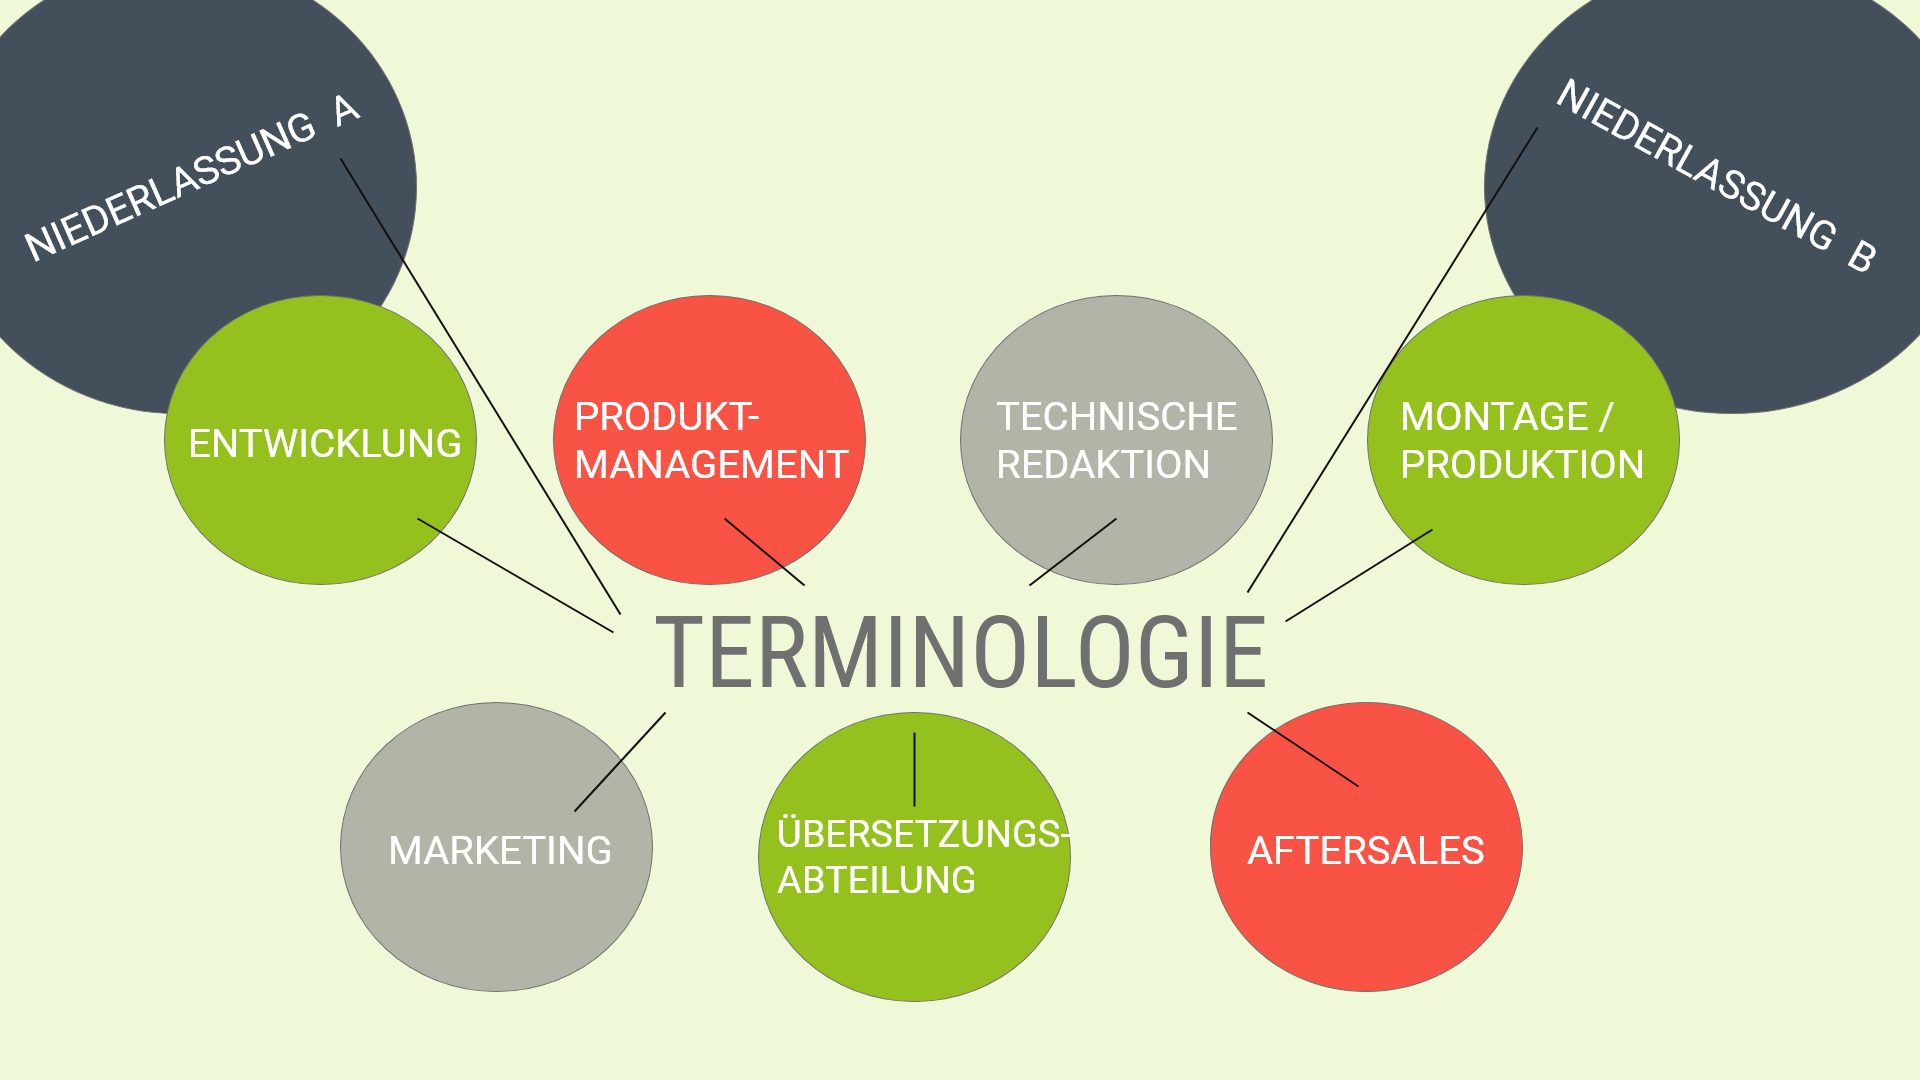 Zielgruppen für standardisierte Terminologie.